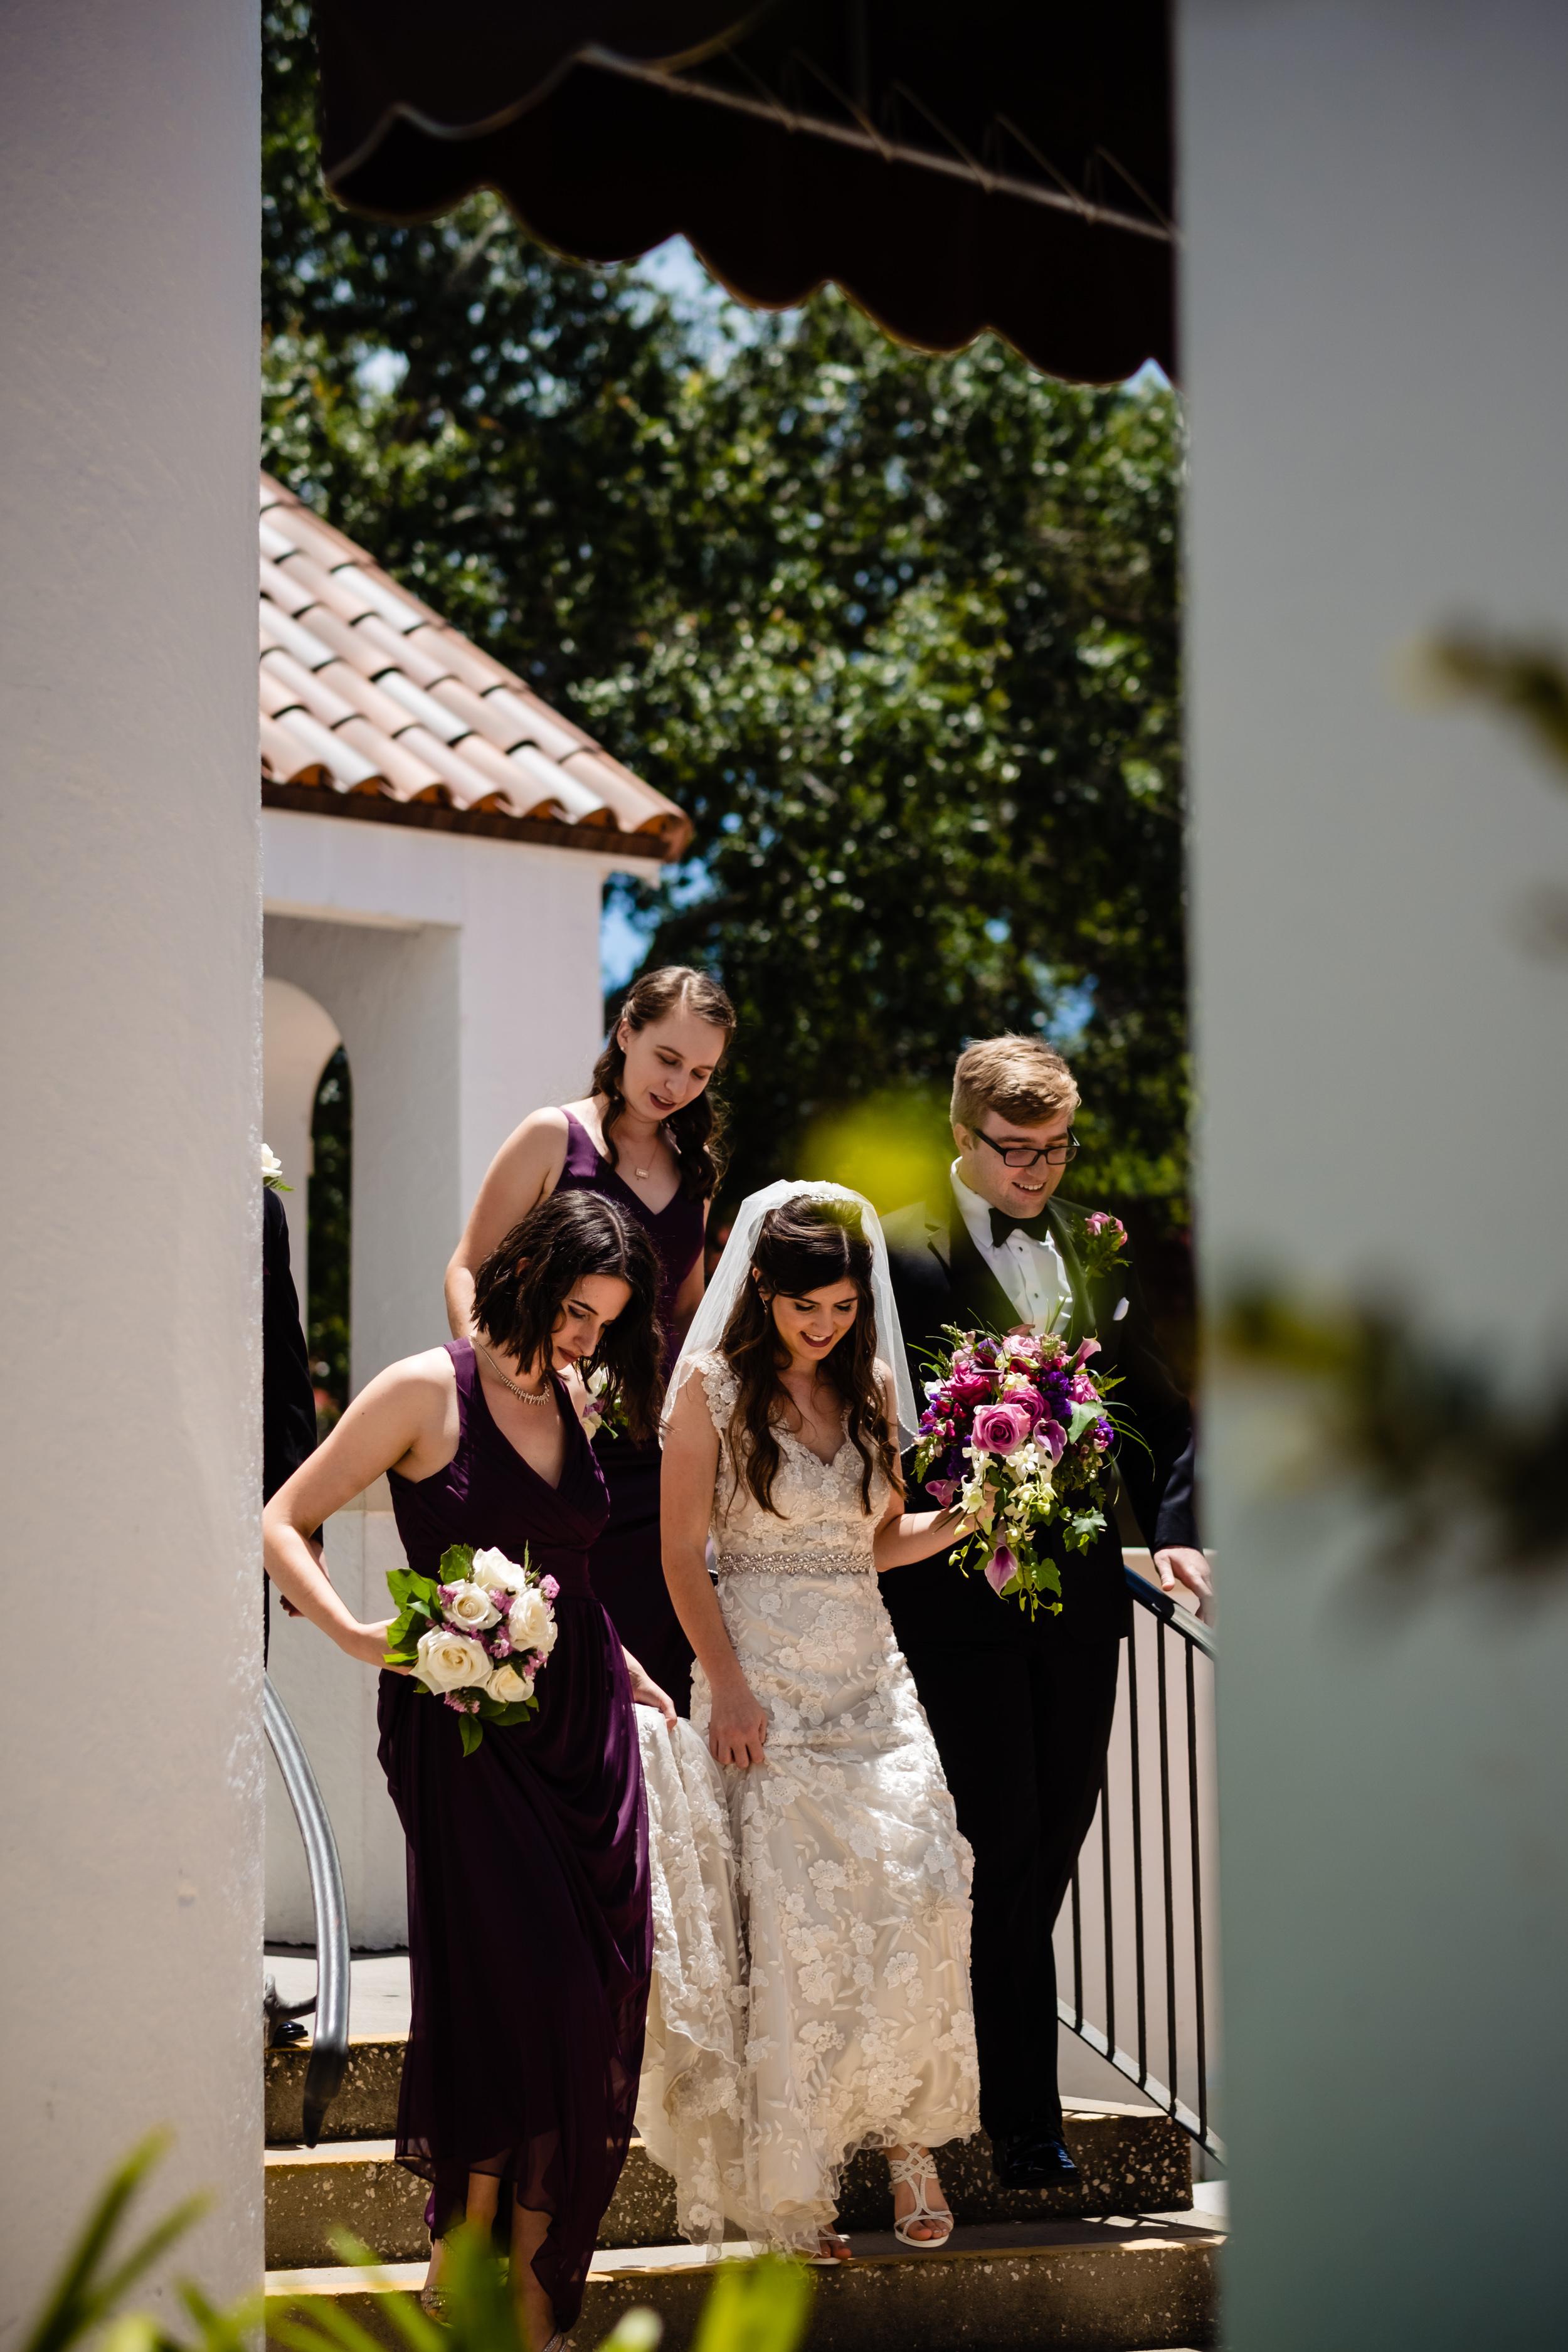 HAH_Zoe and Daniel_Clearwater Wedding_305_2018.jpg